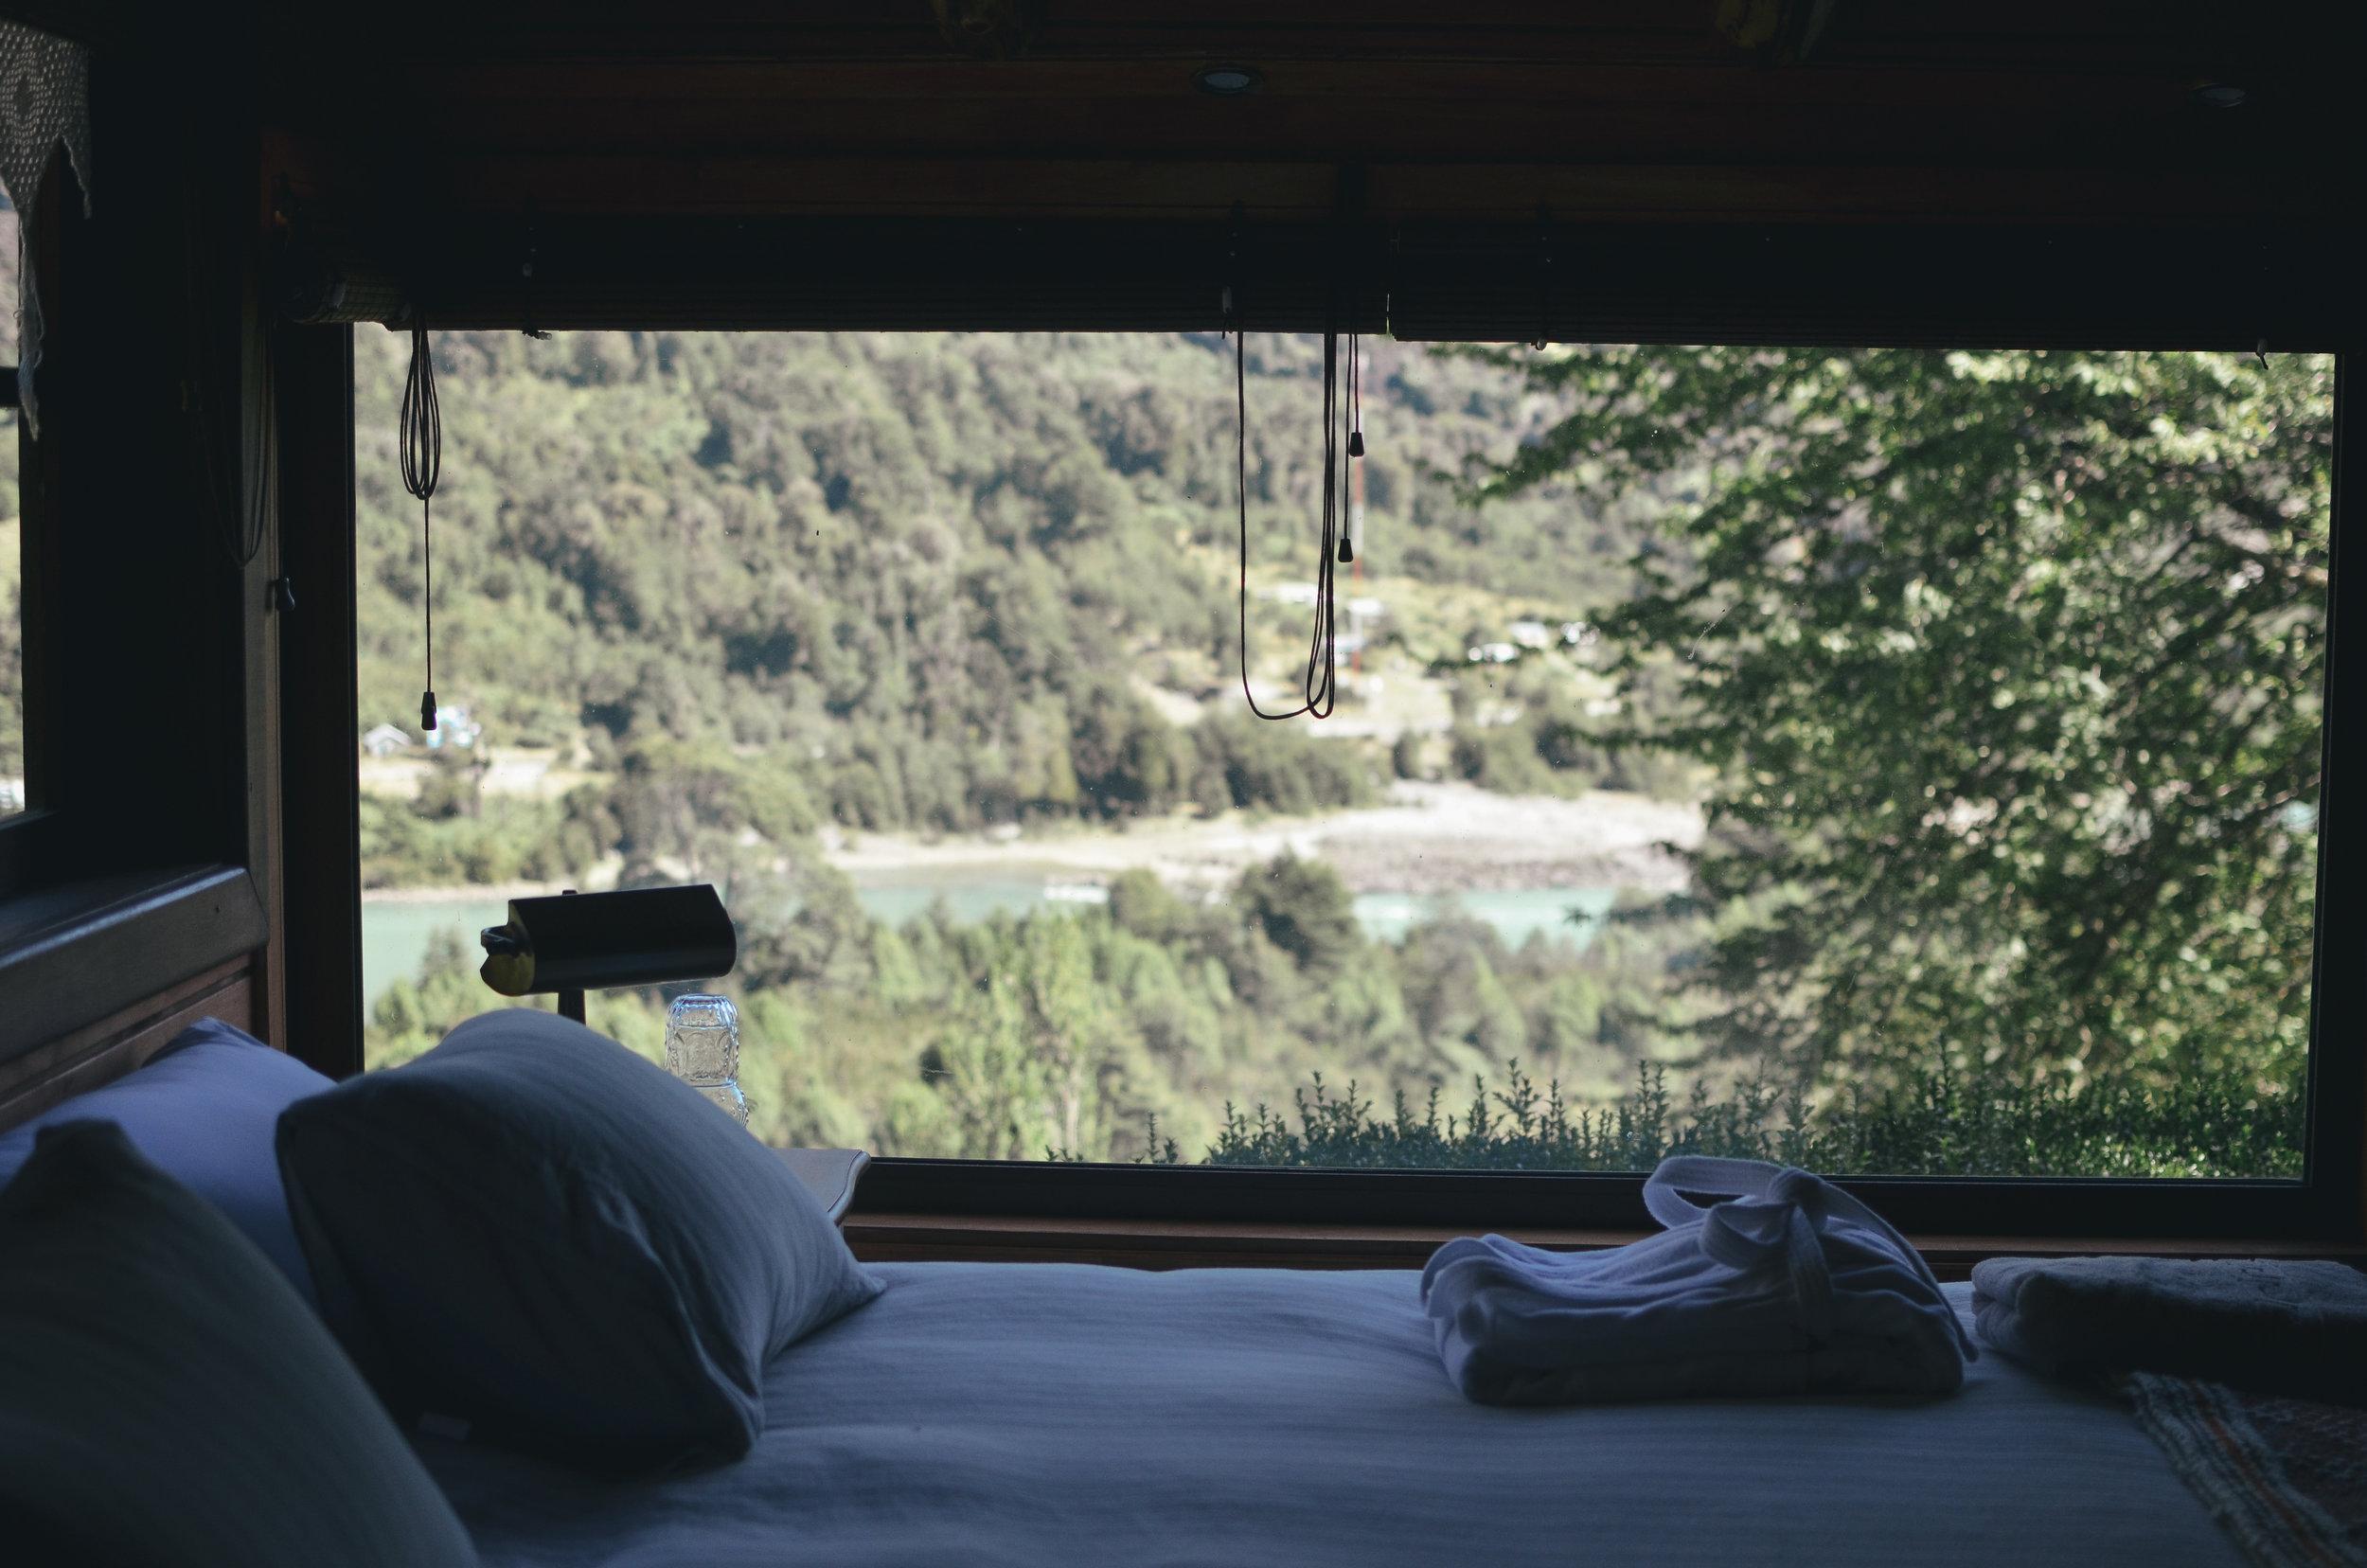 barraco+lodge+chile+life+on+pine+travel+blog+life+on+pine_DSC_1278.jpg